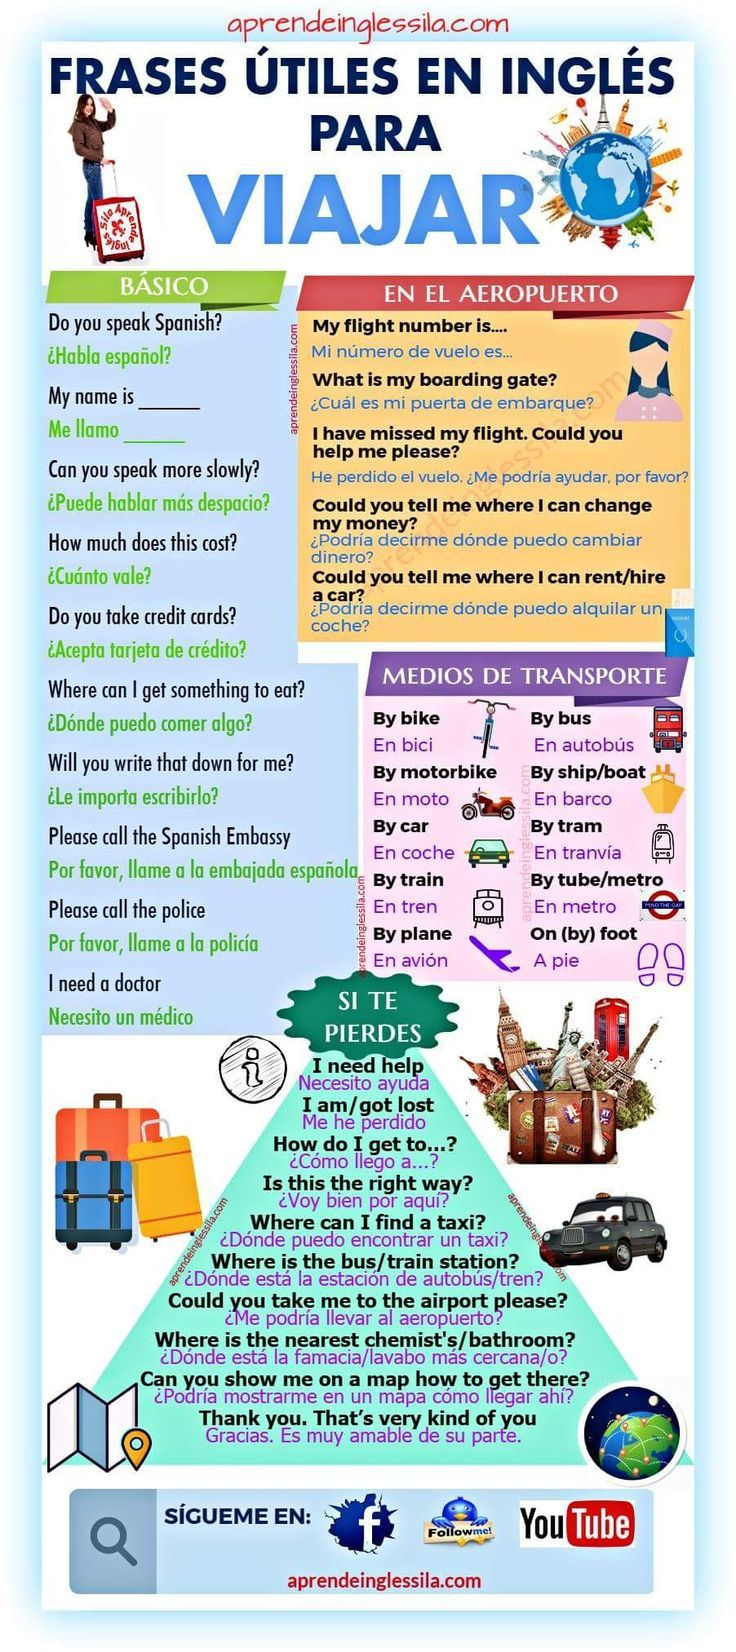 Frases En Ingles Para Viajar Ingles Para Viajar Hablar Español Ingles Britanico